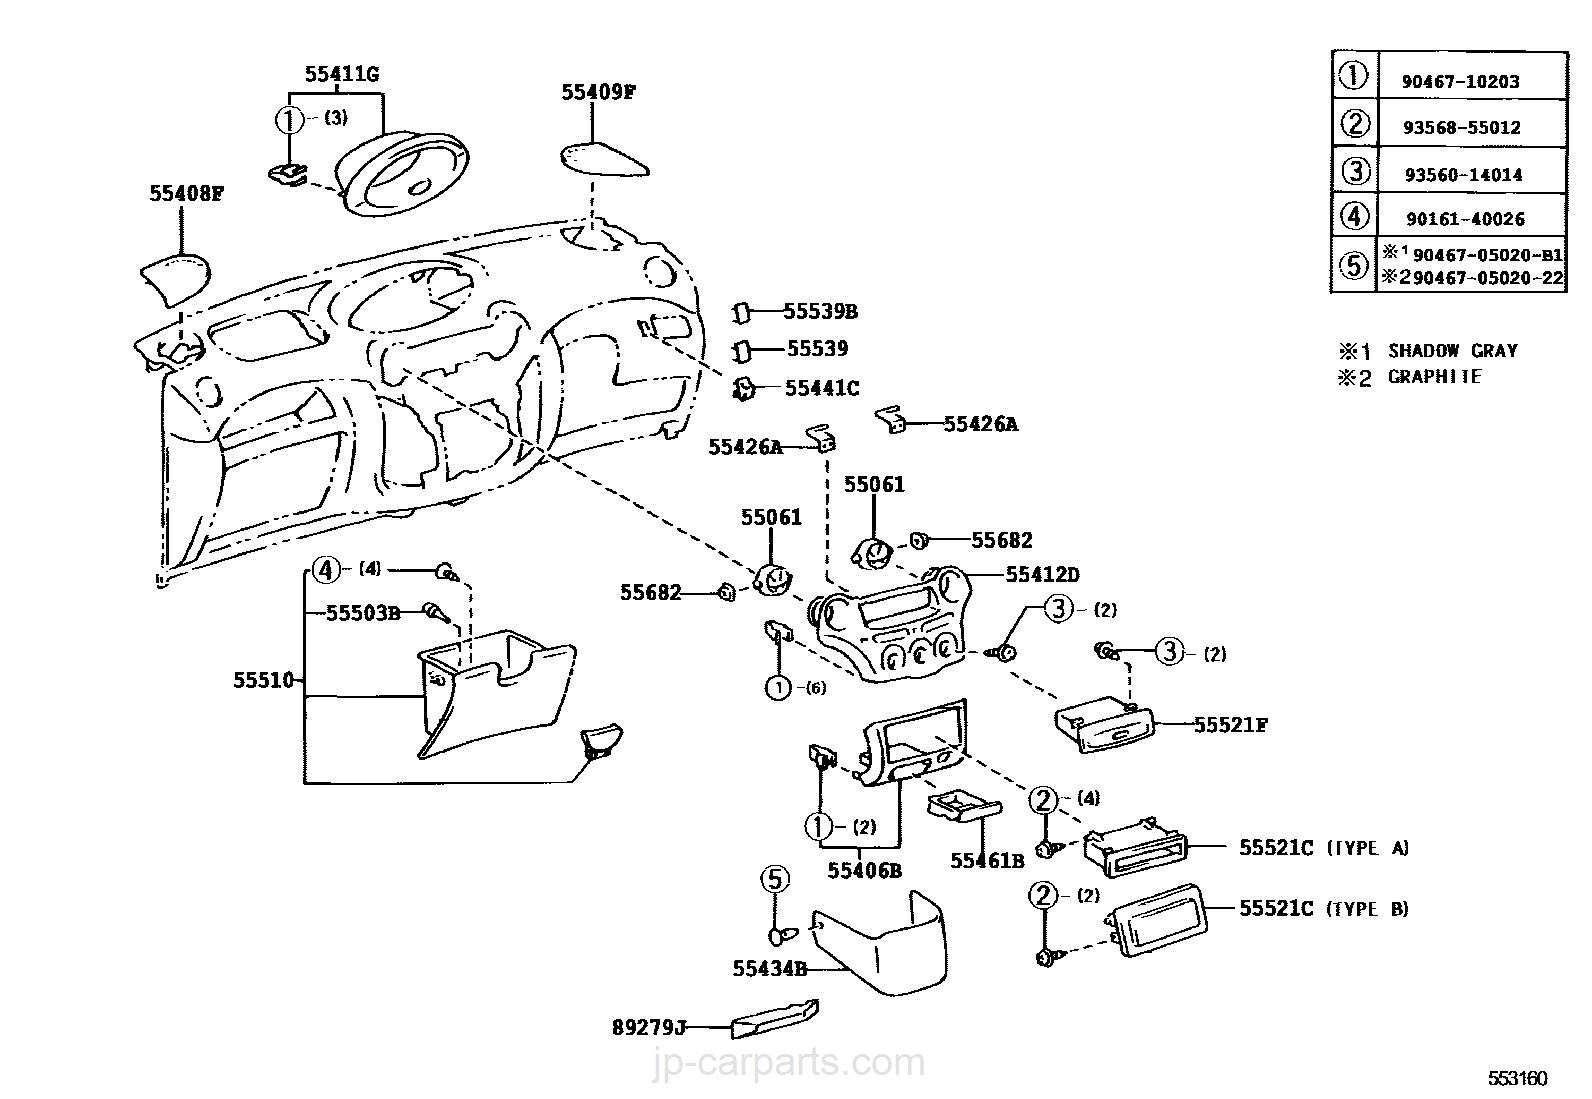 Genuine Hyundai 84690-3J090-WK Console End Cover Assembly